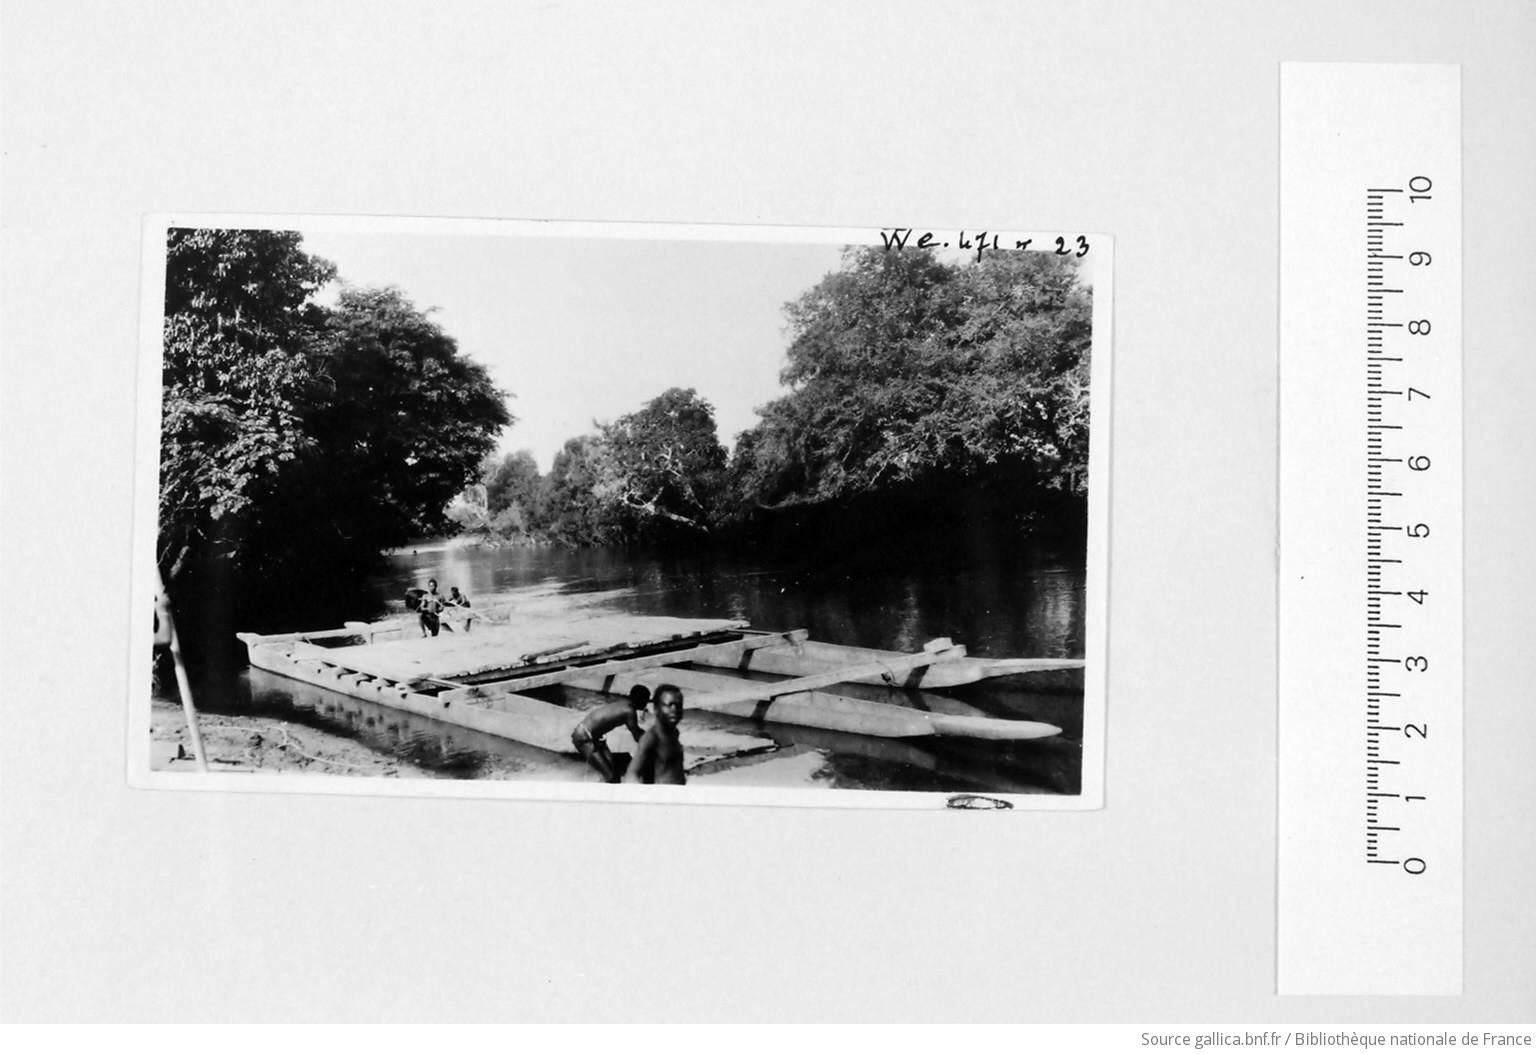 [39 phot. d'A.E.F. en 1924. Enregistré en 1936] - 23